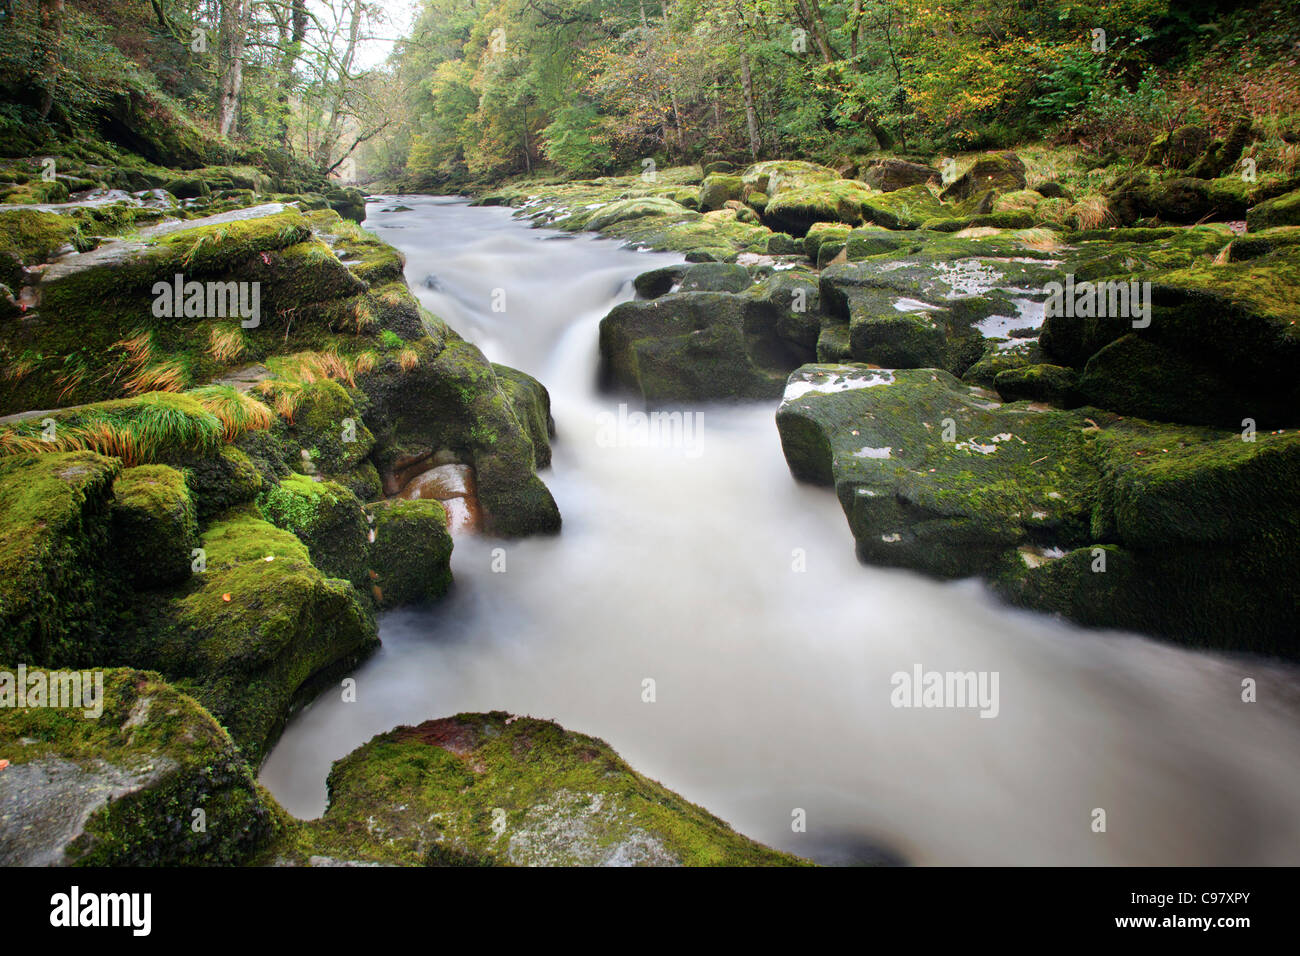 Strid Wood; River Wharfe; Bolton Abbey; Yorkshire; UK - Stock Image